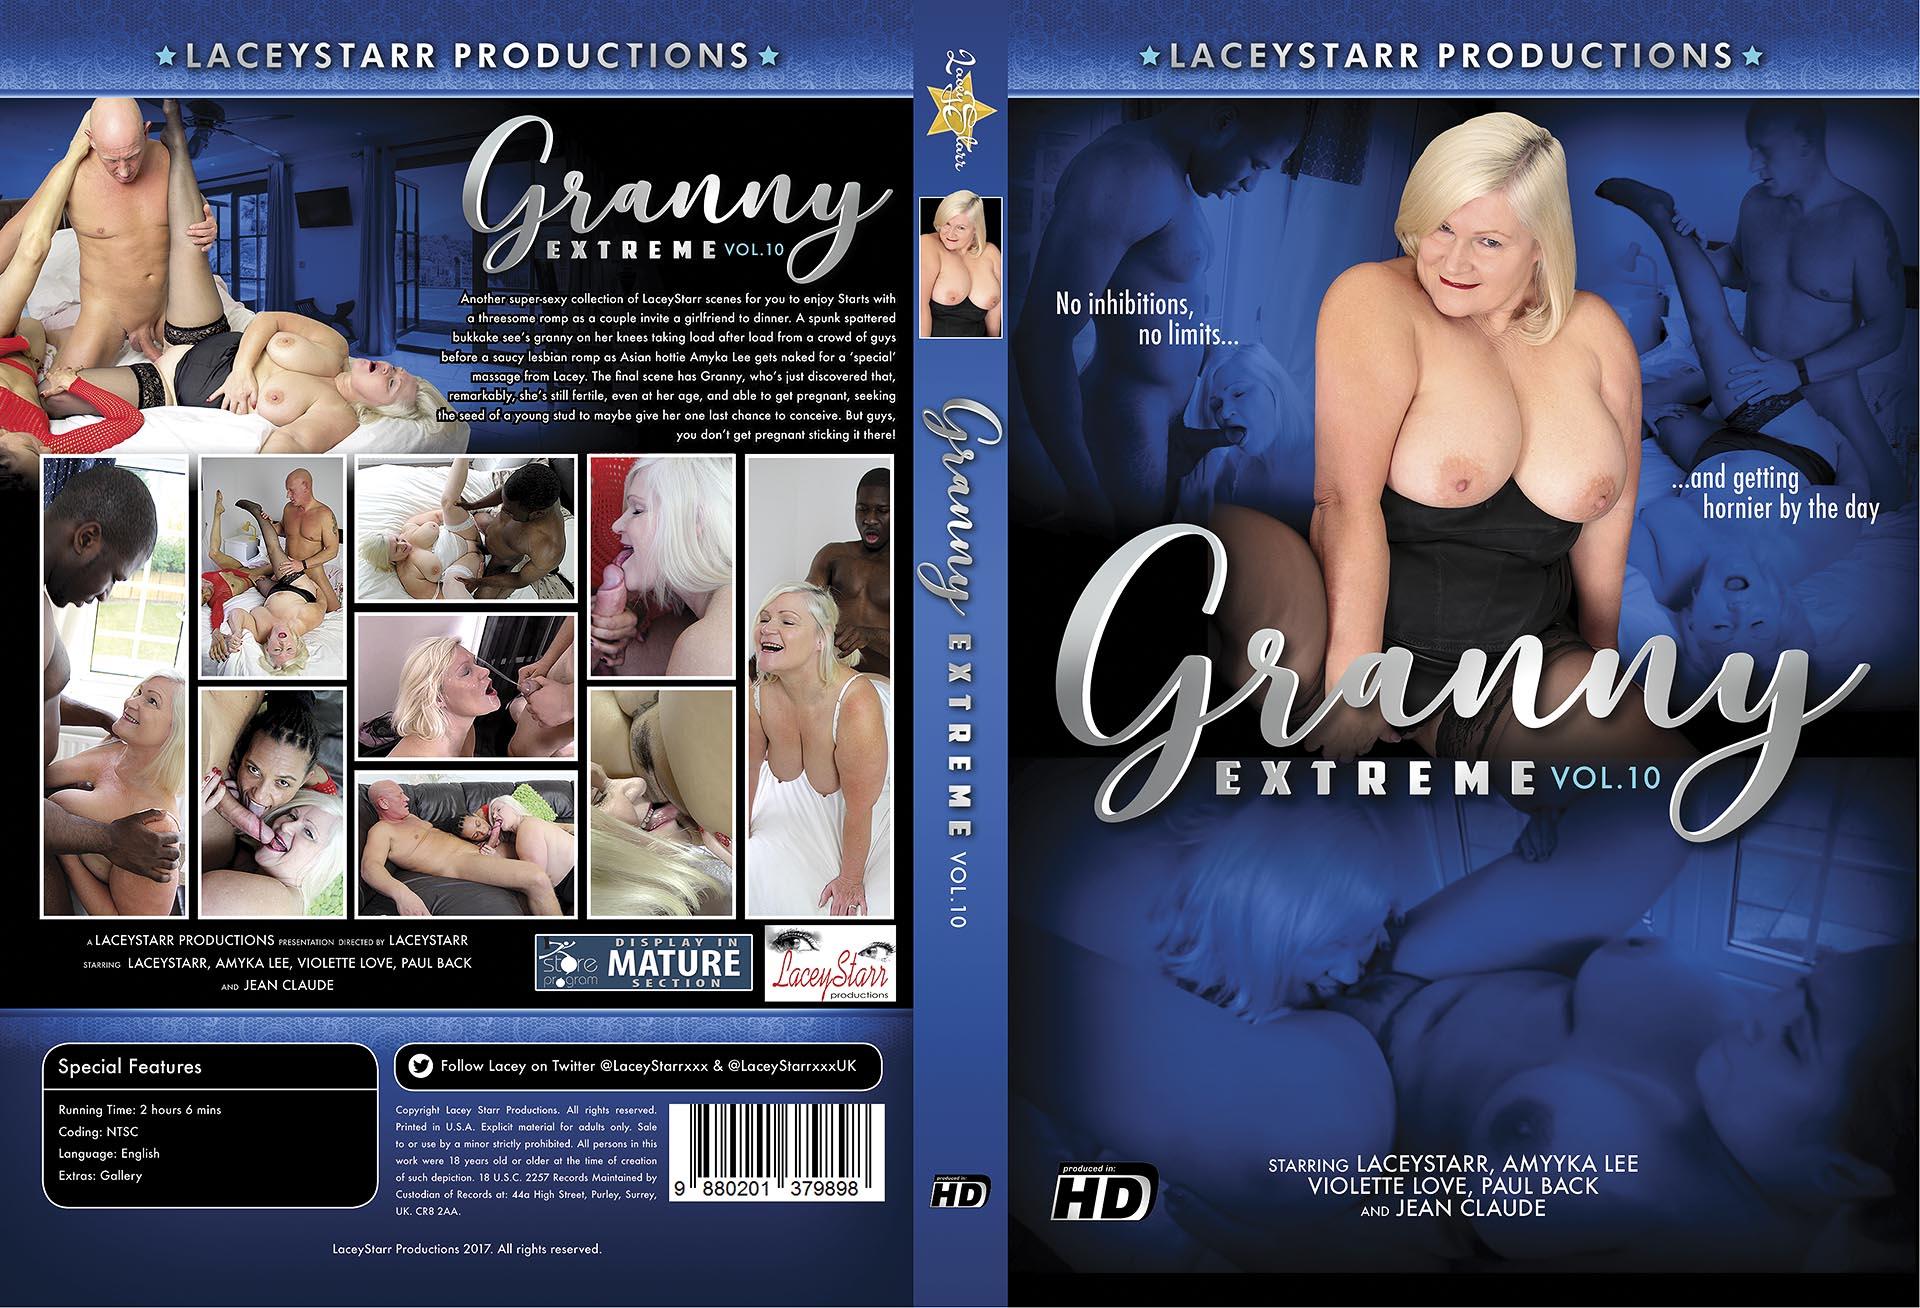 LS_GrannyExtreme_Volume10_UK_Sleeve_Large.jpg